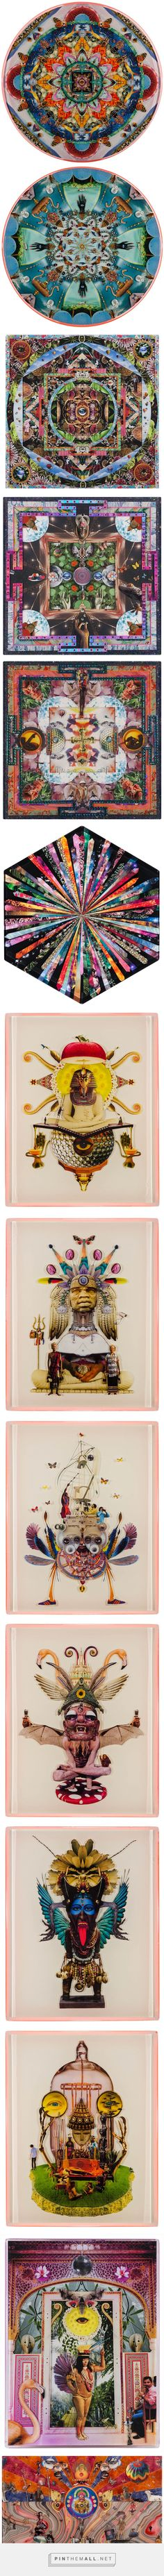 Juxtapoz Magazine - Sebastian Wahl: Psychedelic Gravy for the Receptive Mind